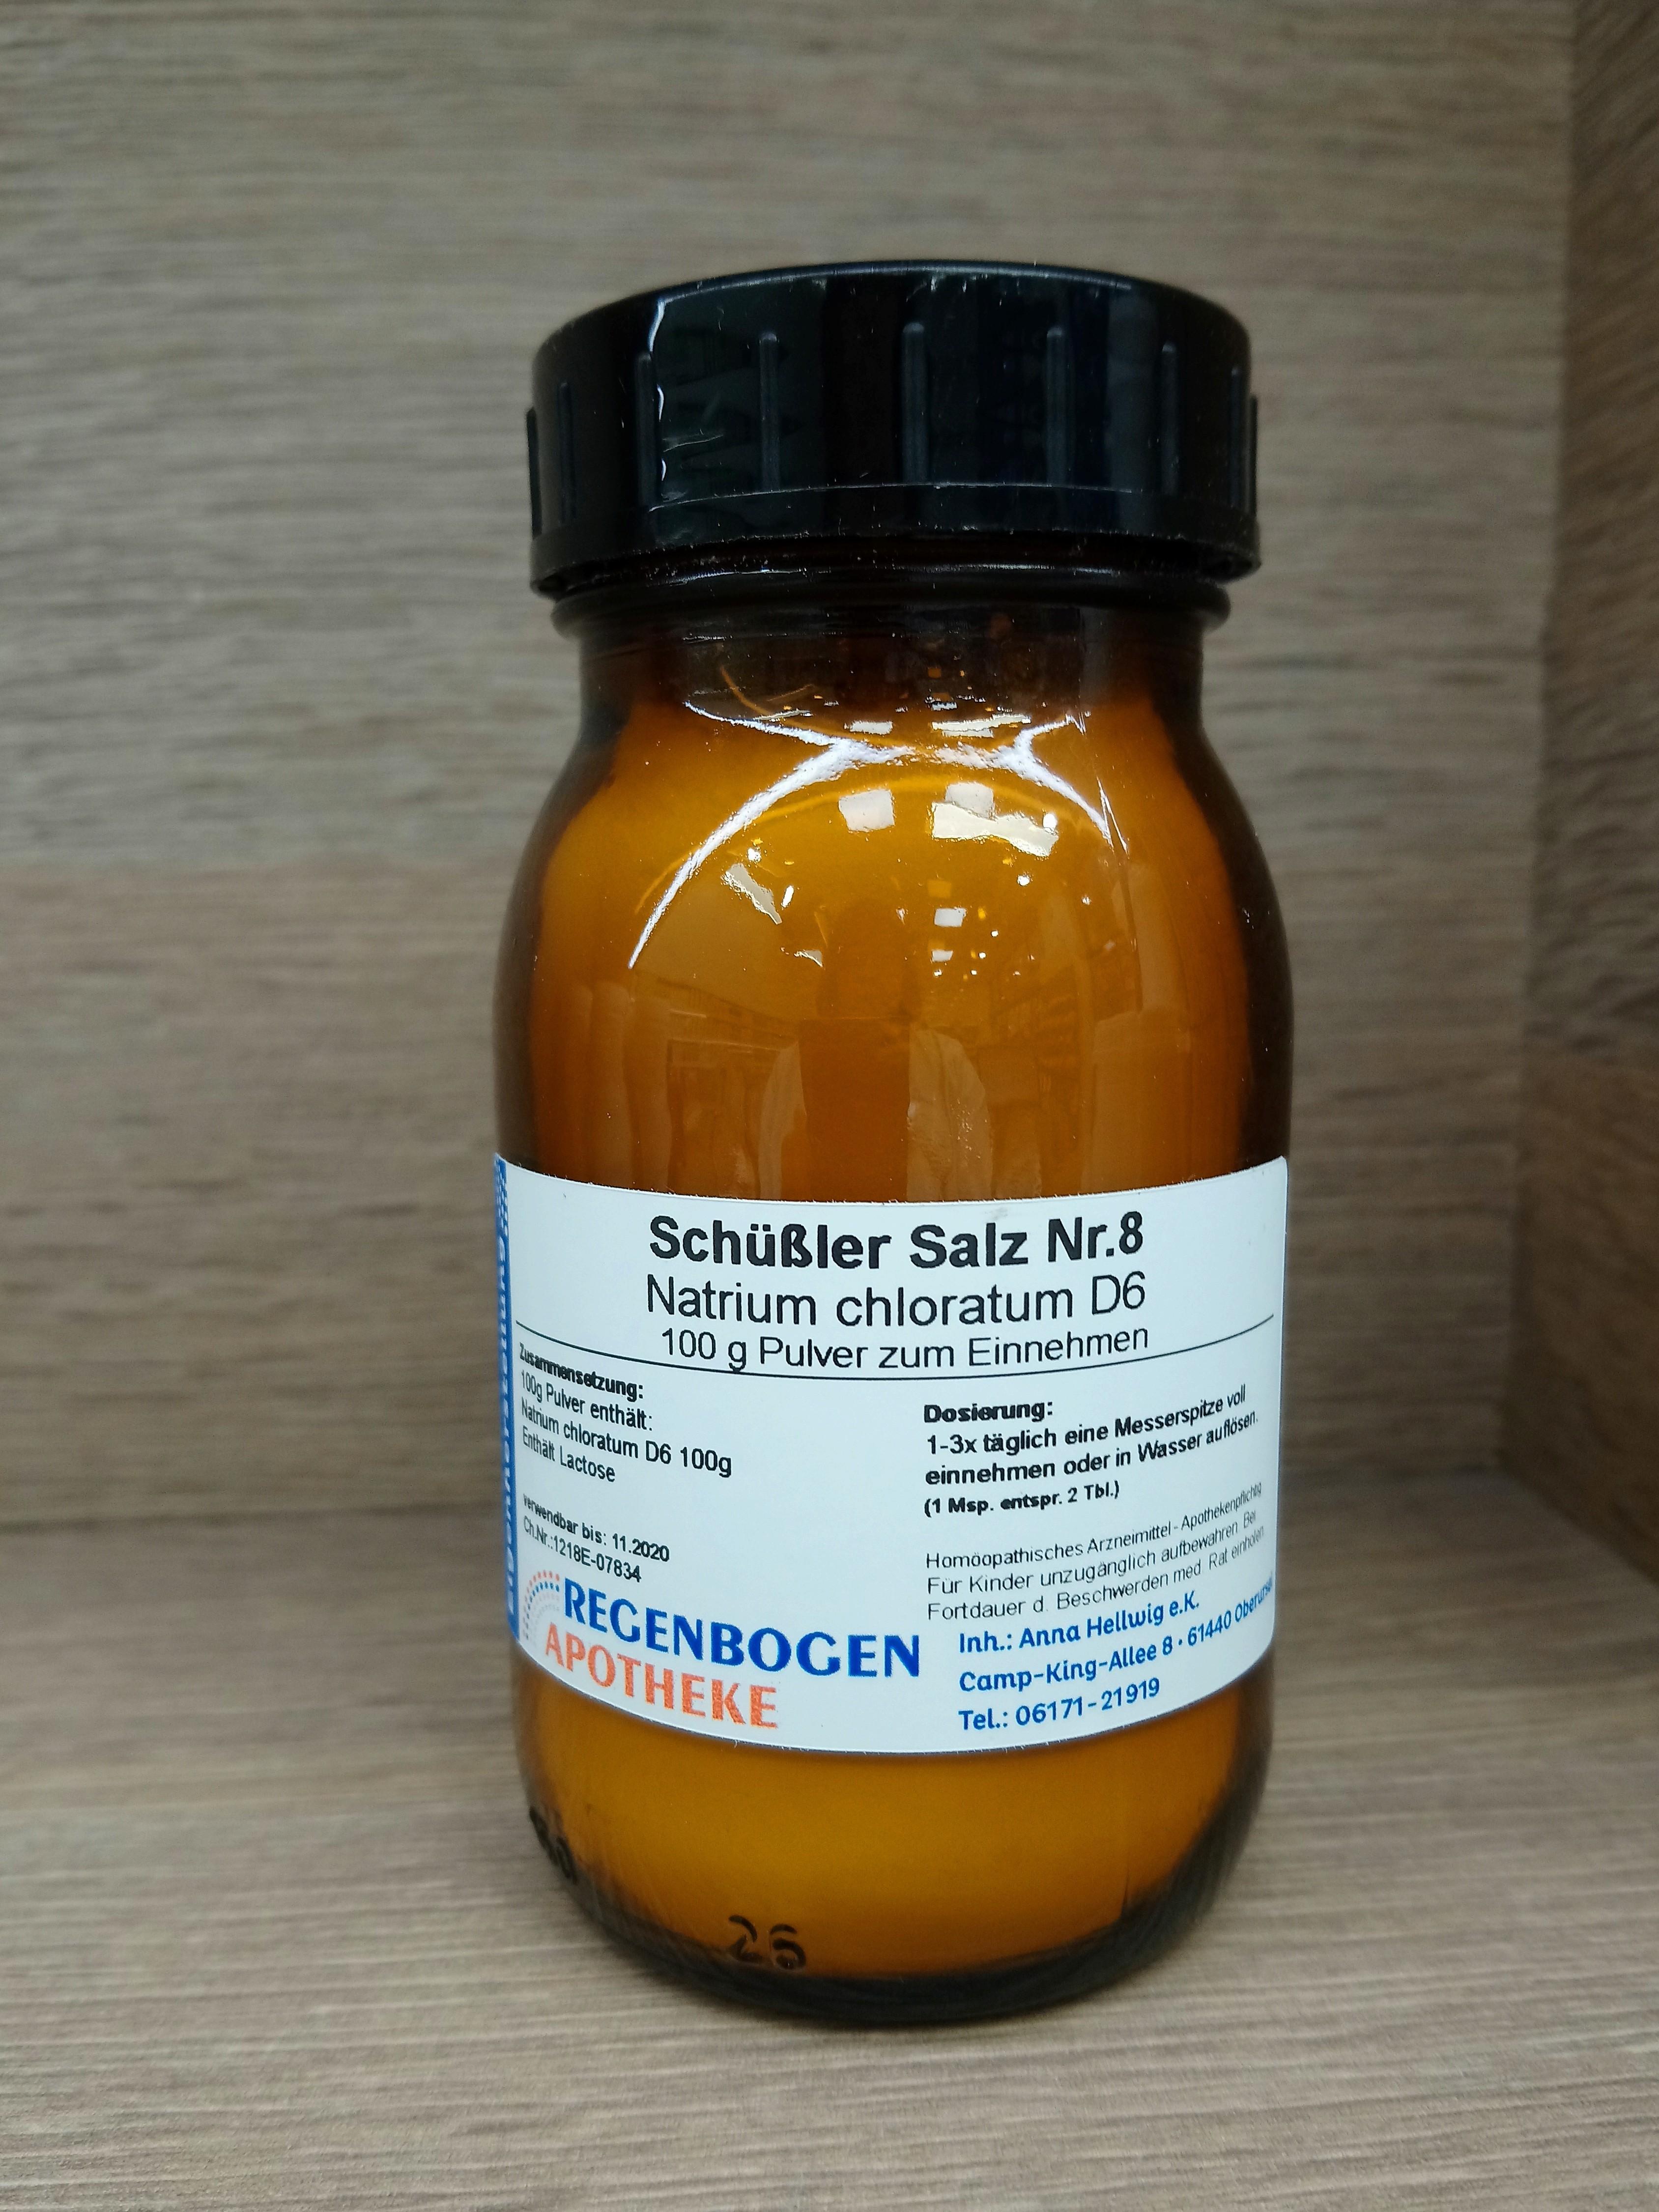 Schüßler Salz Nr. 8 Natrium chloratum D6 100g Pulver